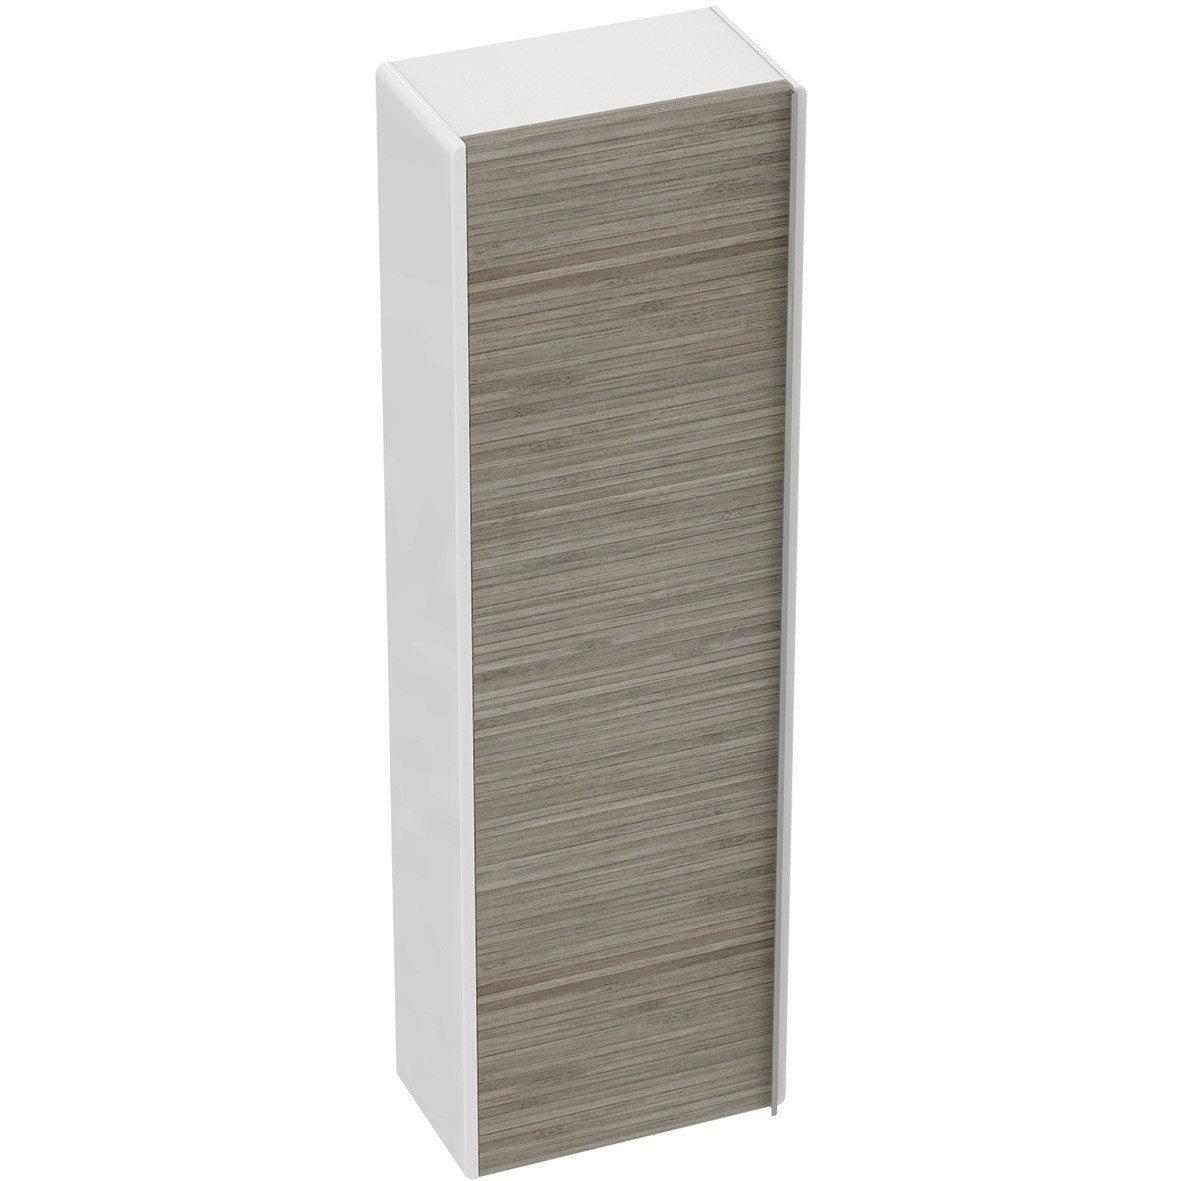 meuble demi colonne x x cm imitation bambou idealsmart leroy merlin. Black Bedroom Furniture Sets. Home Design Ideas